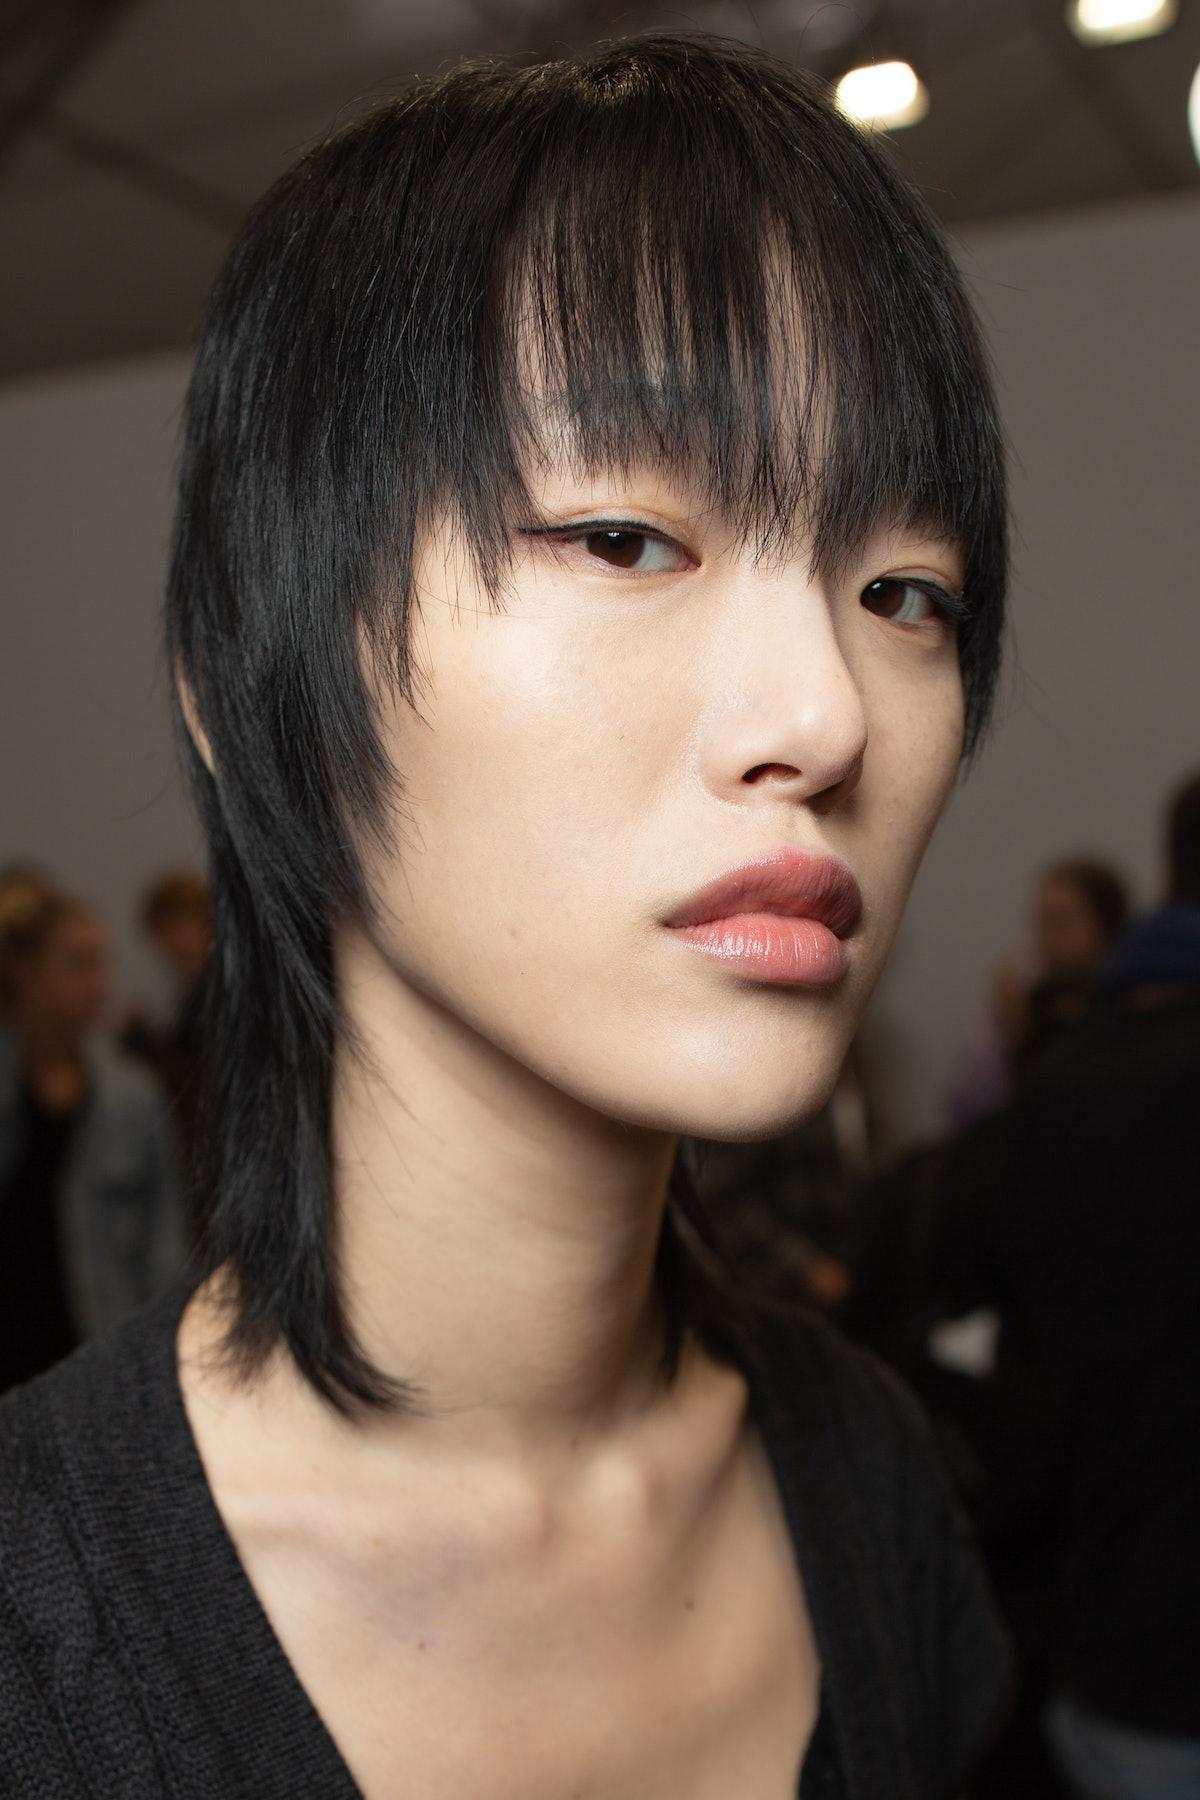 Serichai_Dior_BTS-032.jpg